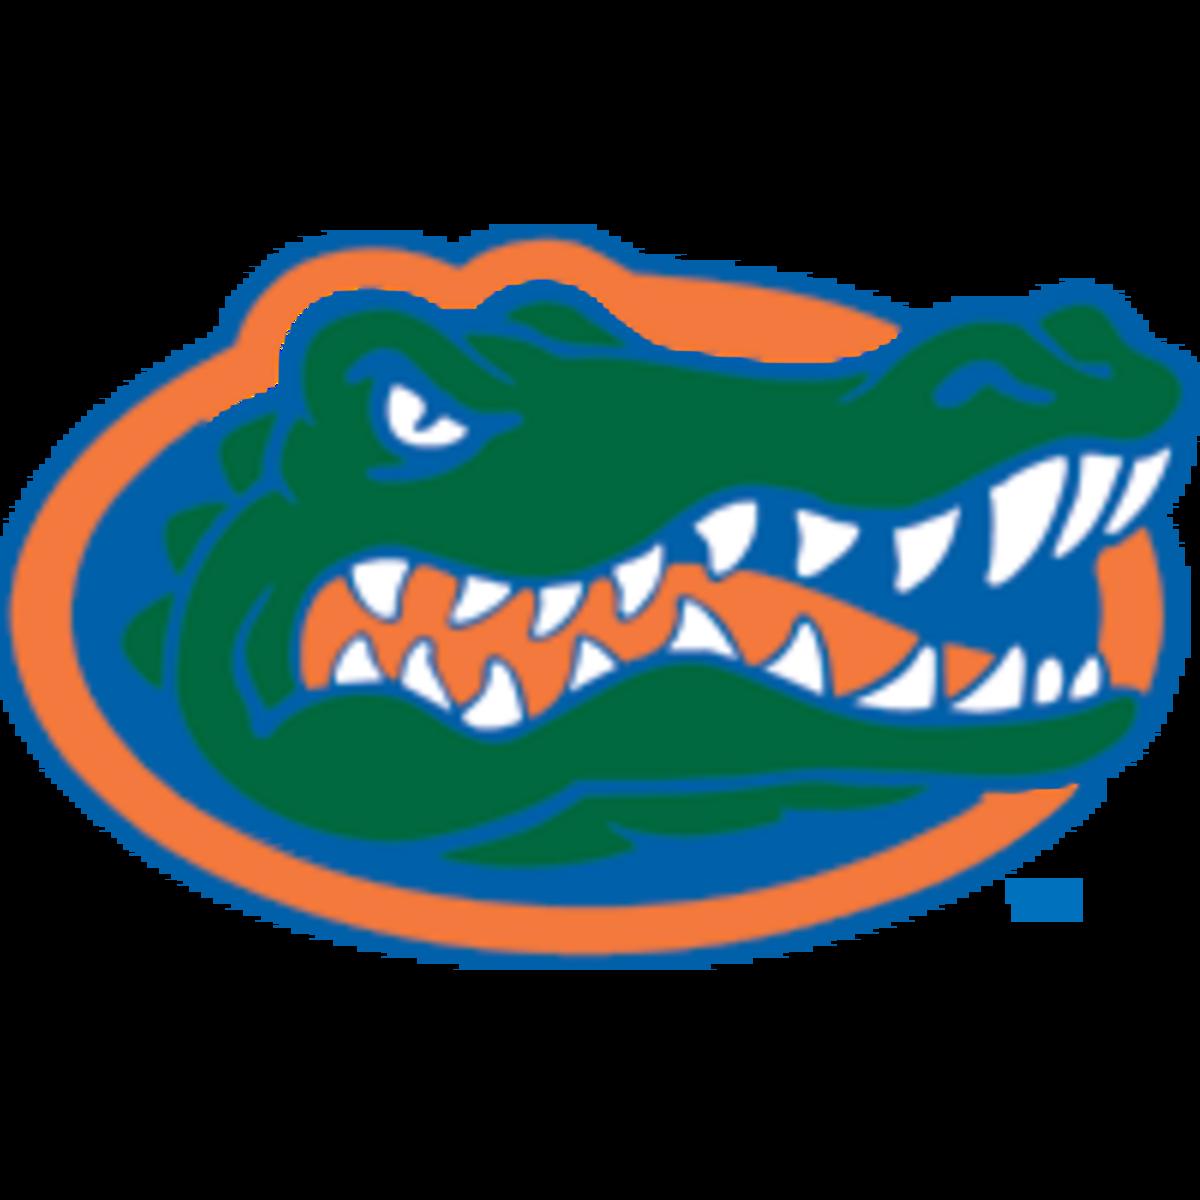 College Football Top 25 Rankings: Florida